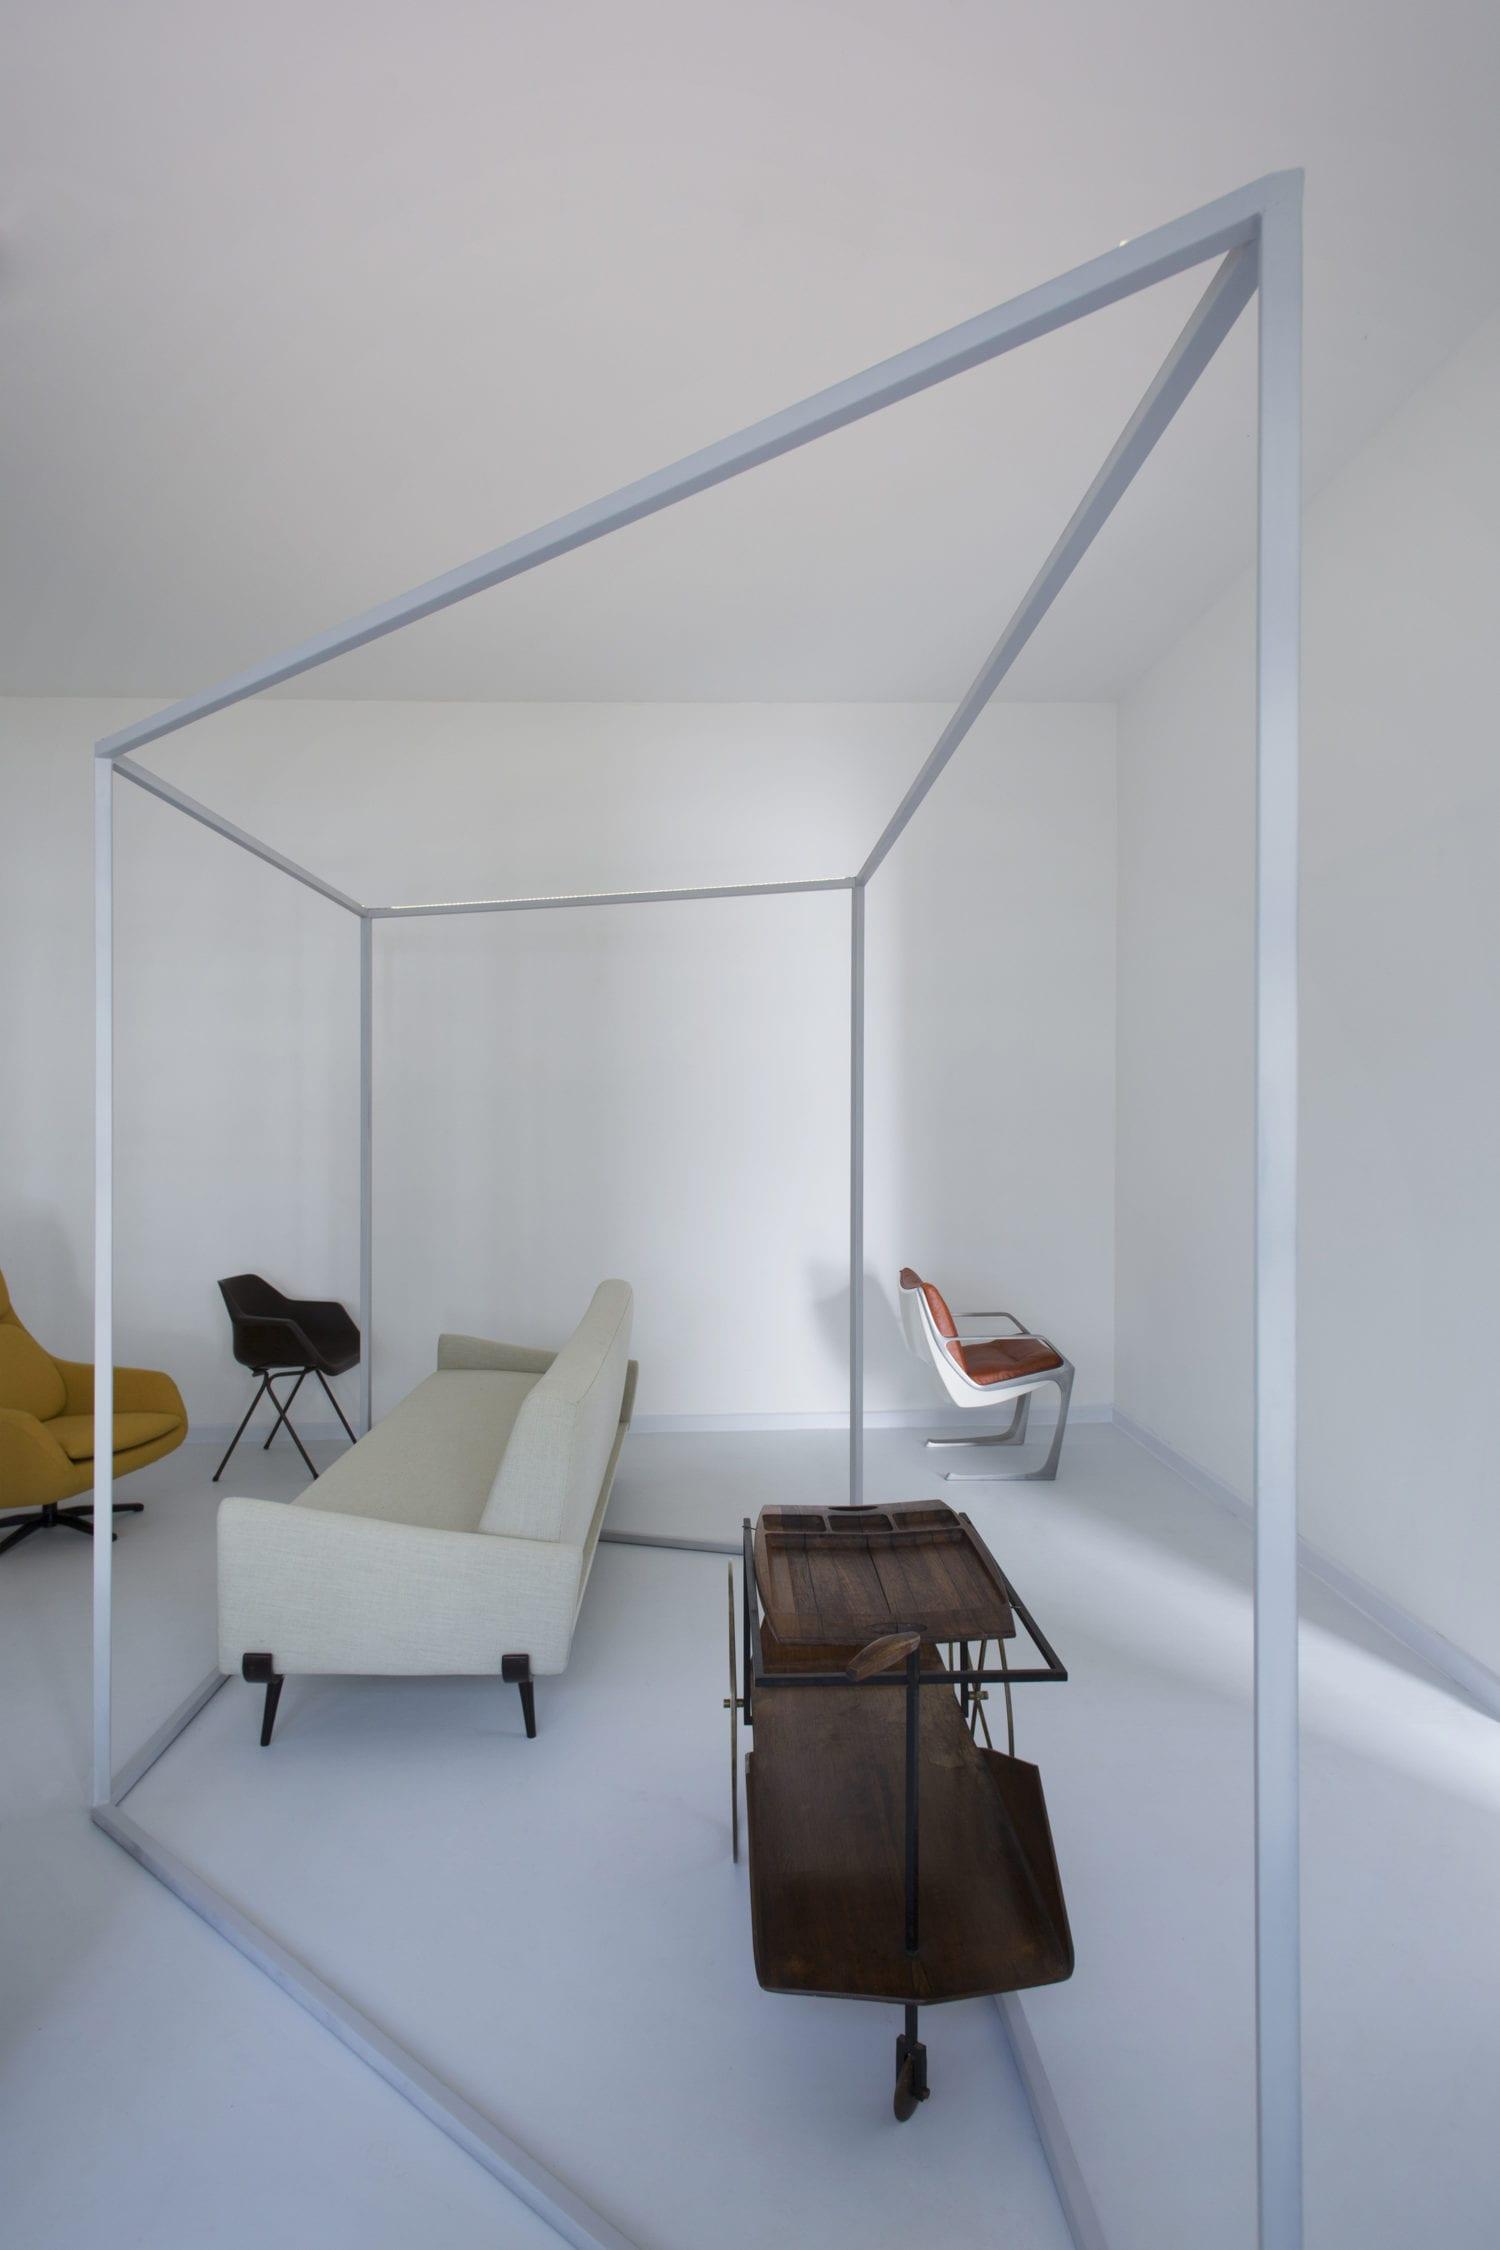 Apartment 61 Home Gallery In Sao Paulo Brazil By Mnma Studio Yellowtrace 05